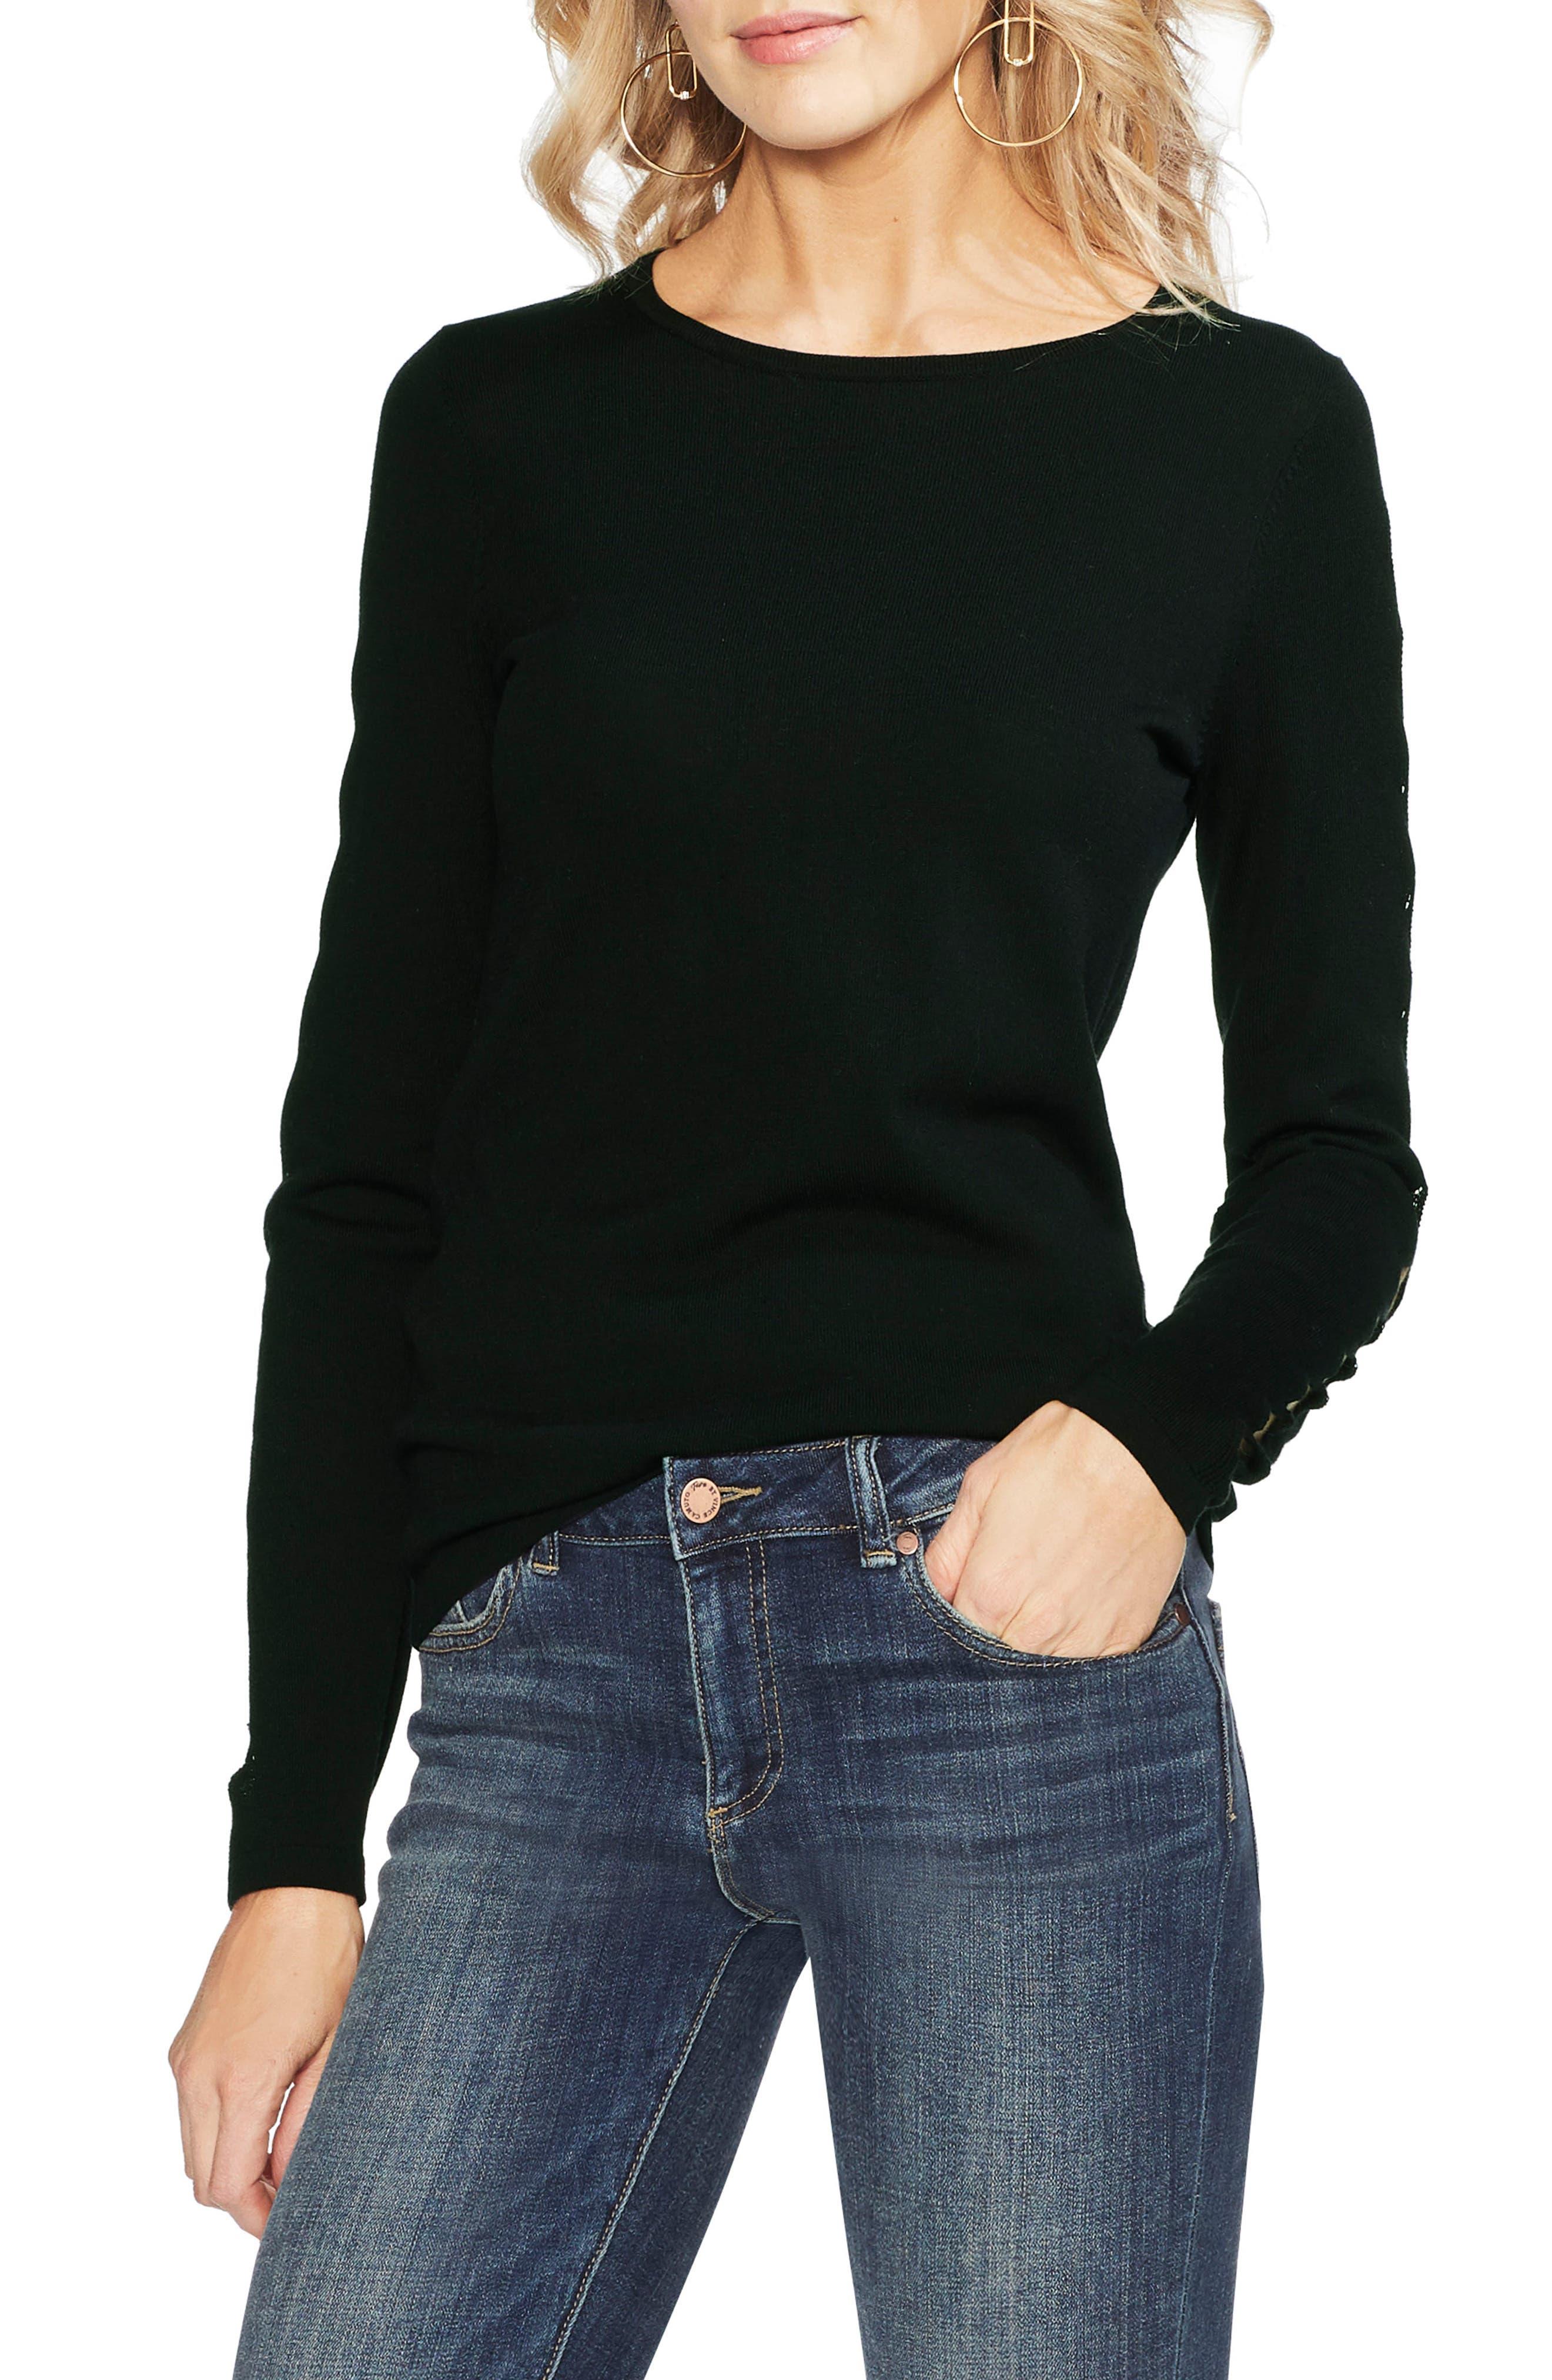 Vince Camuto Cutout Sleeve Sweater, Black